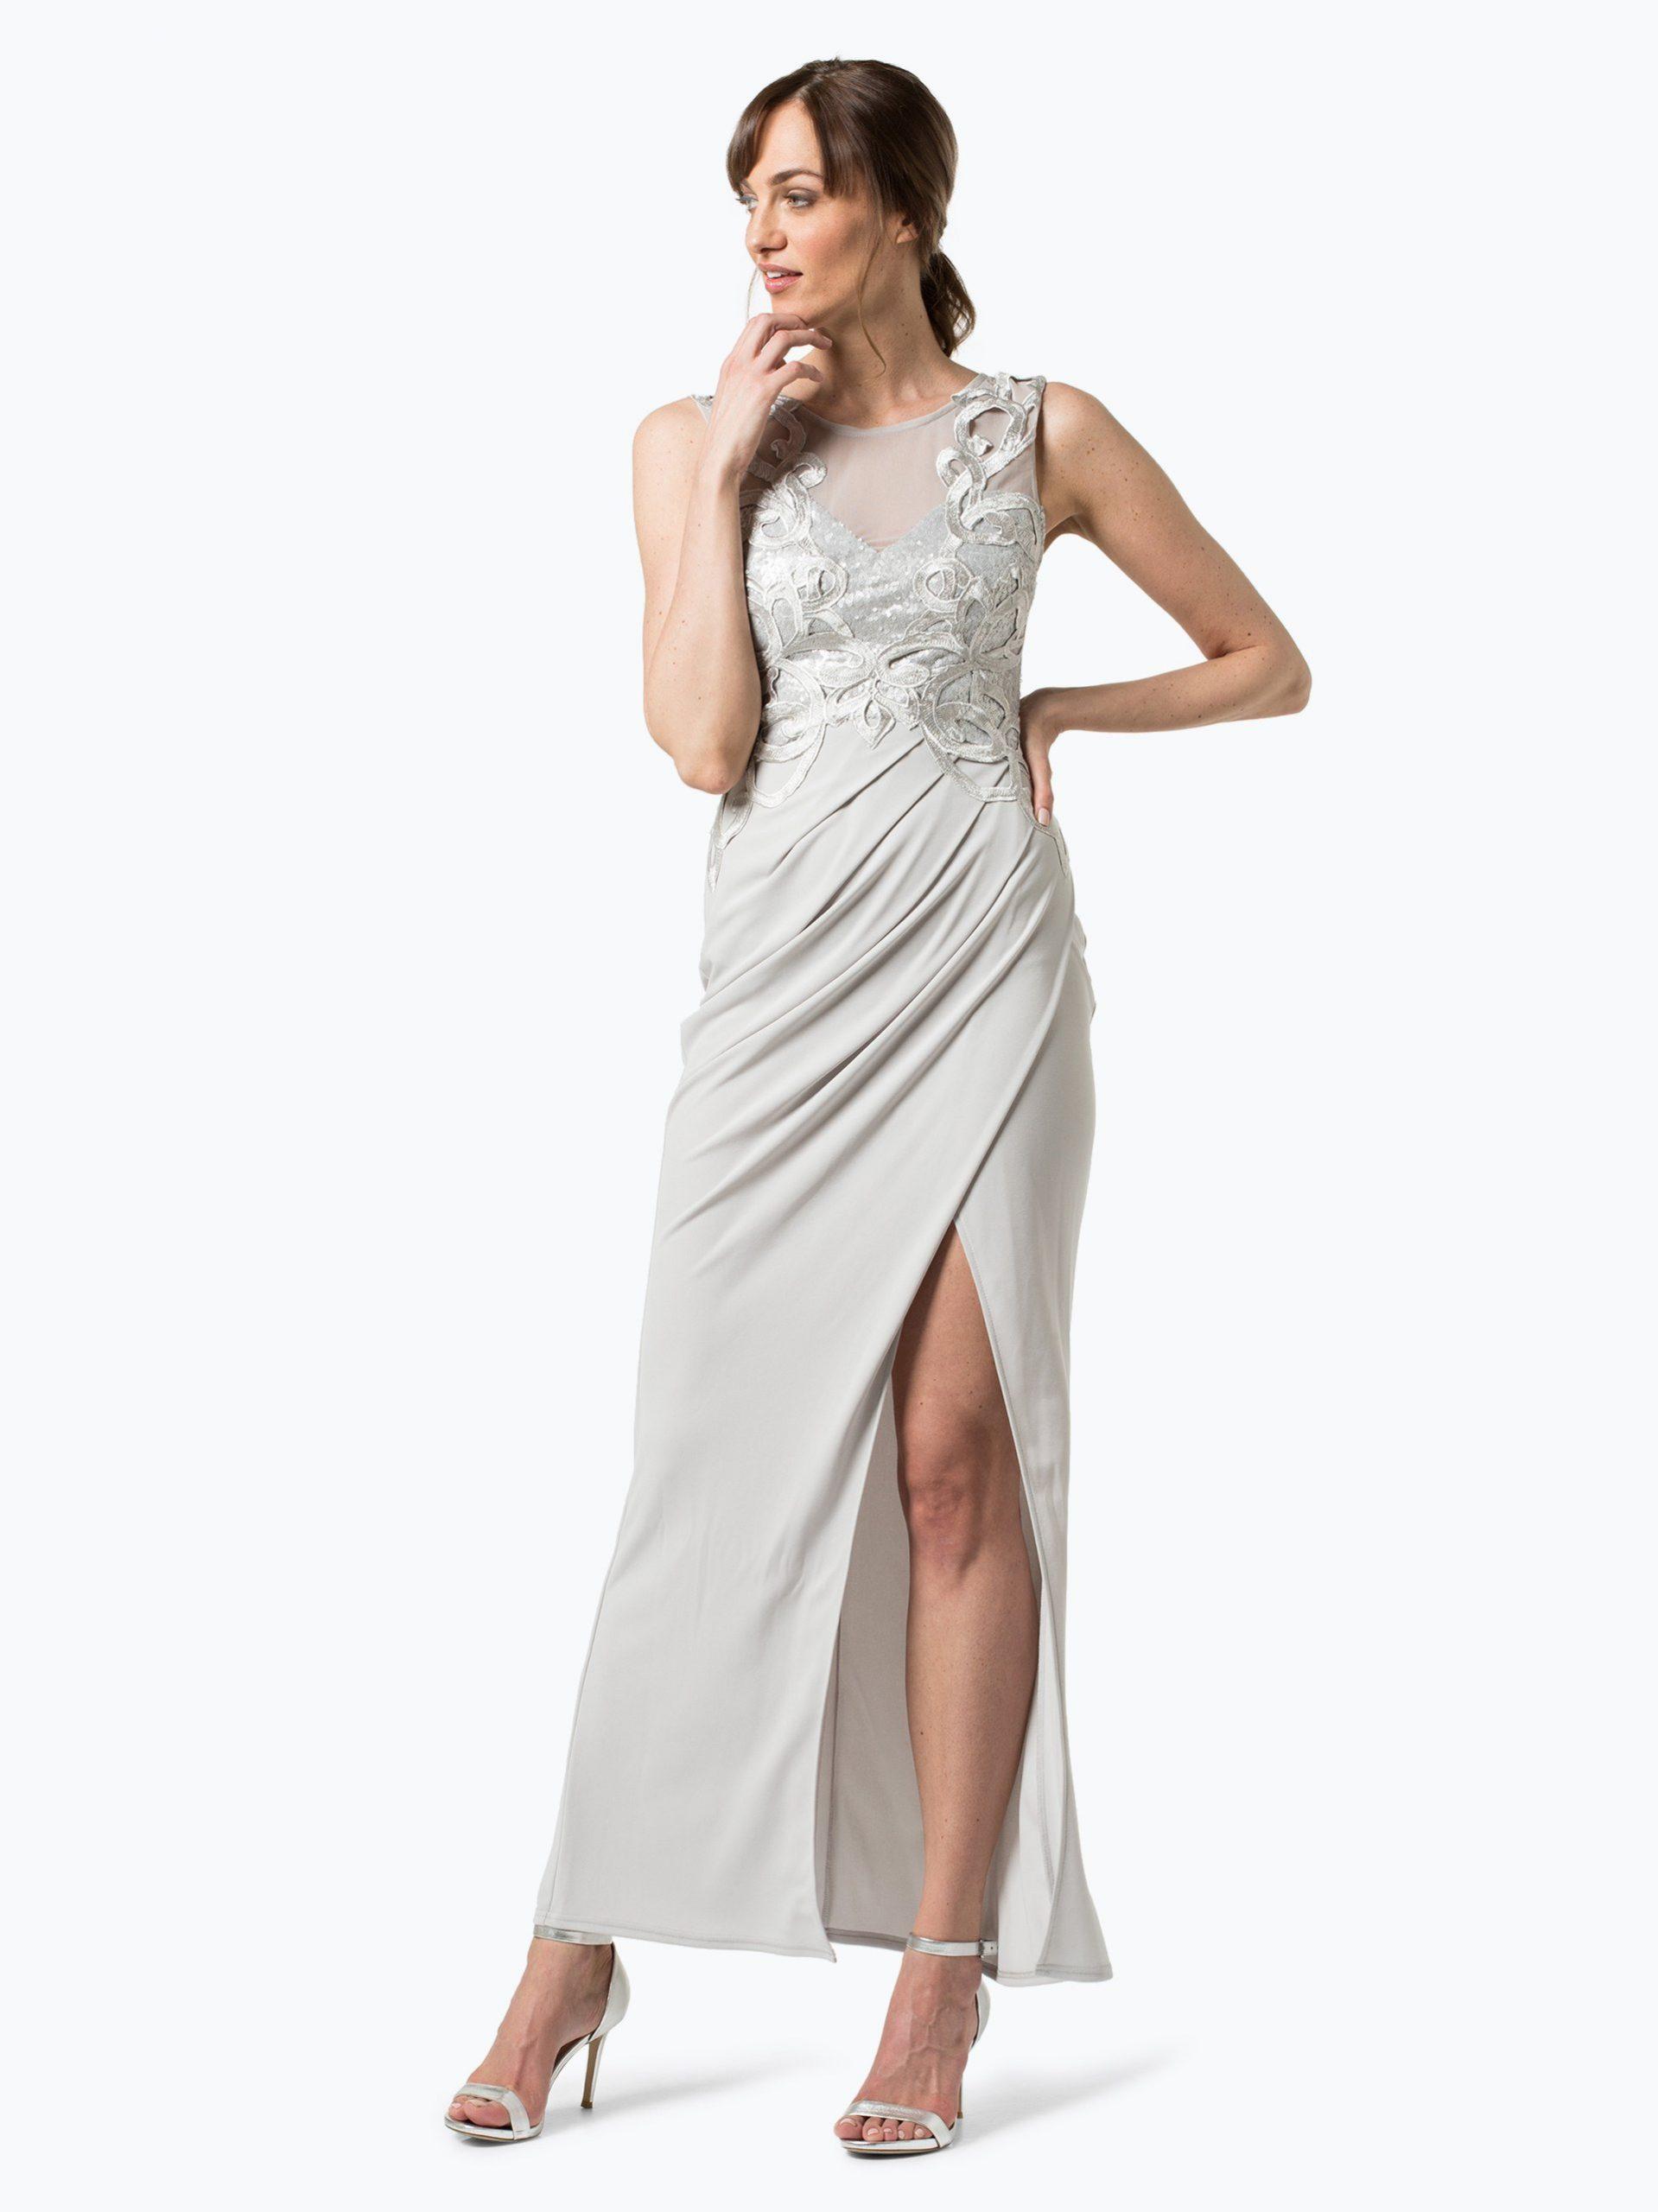 Lipsy Damen Abendkleid Online Kaufen  Peekundcloppenburgde